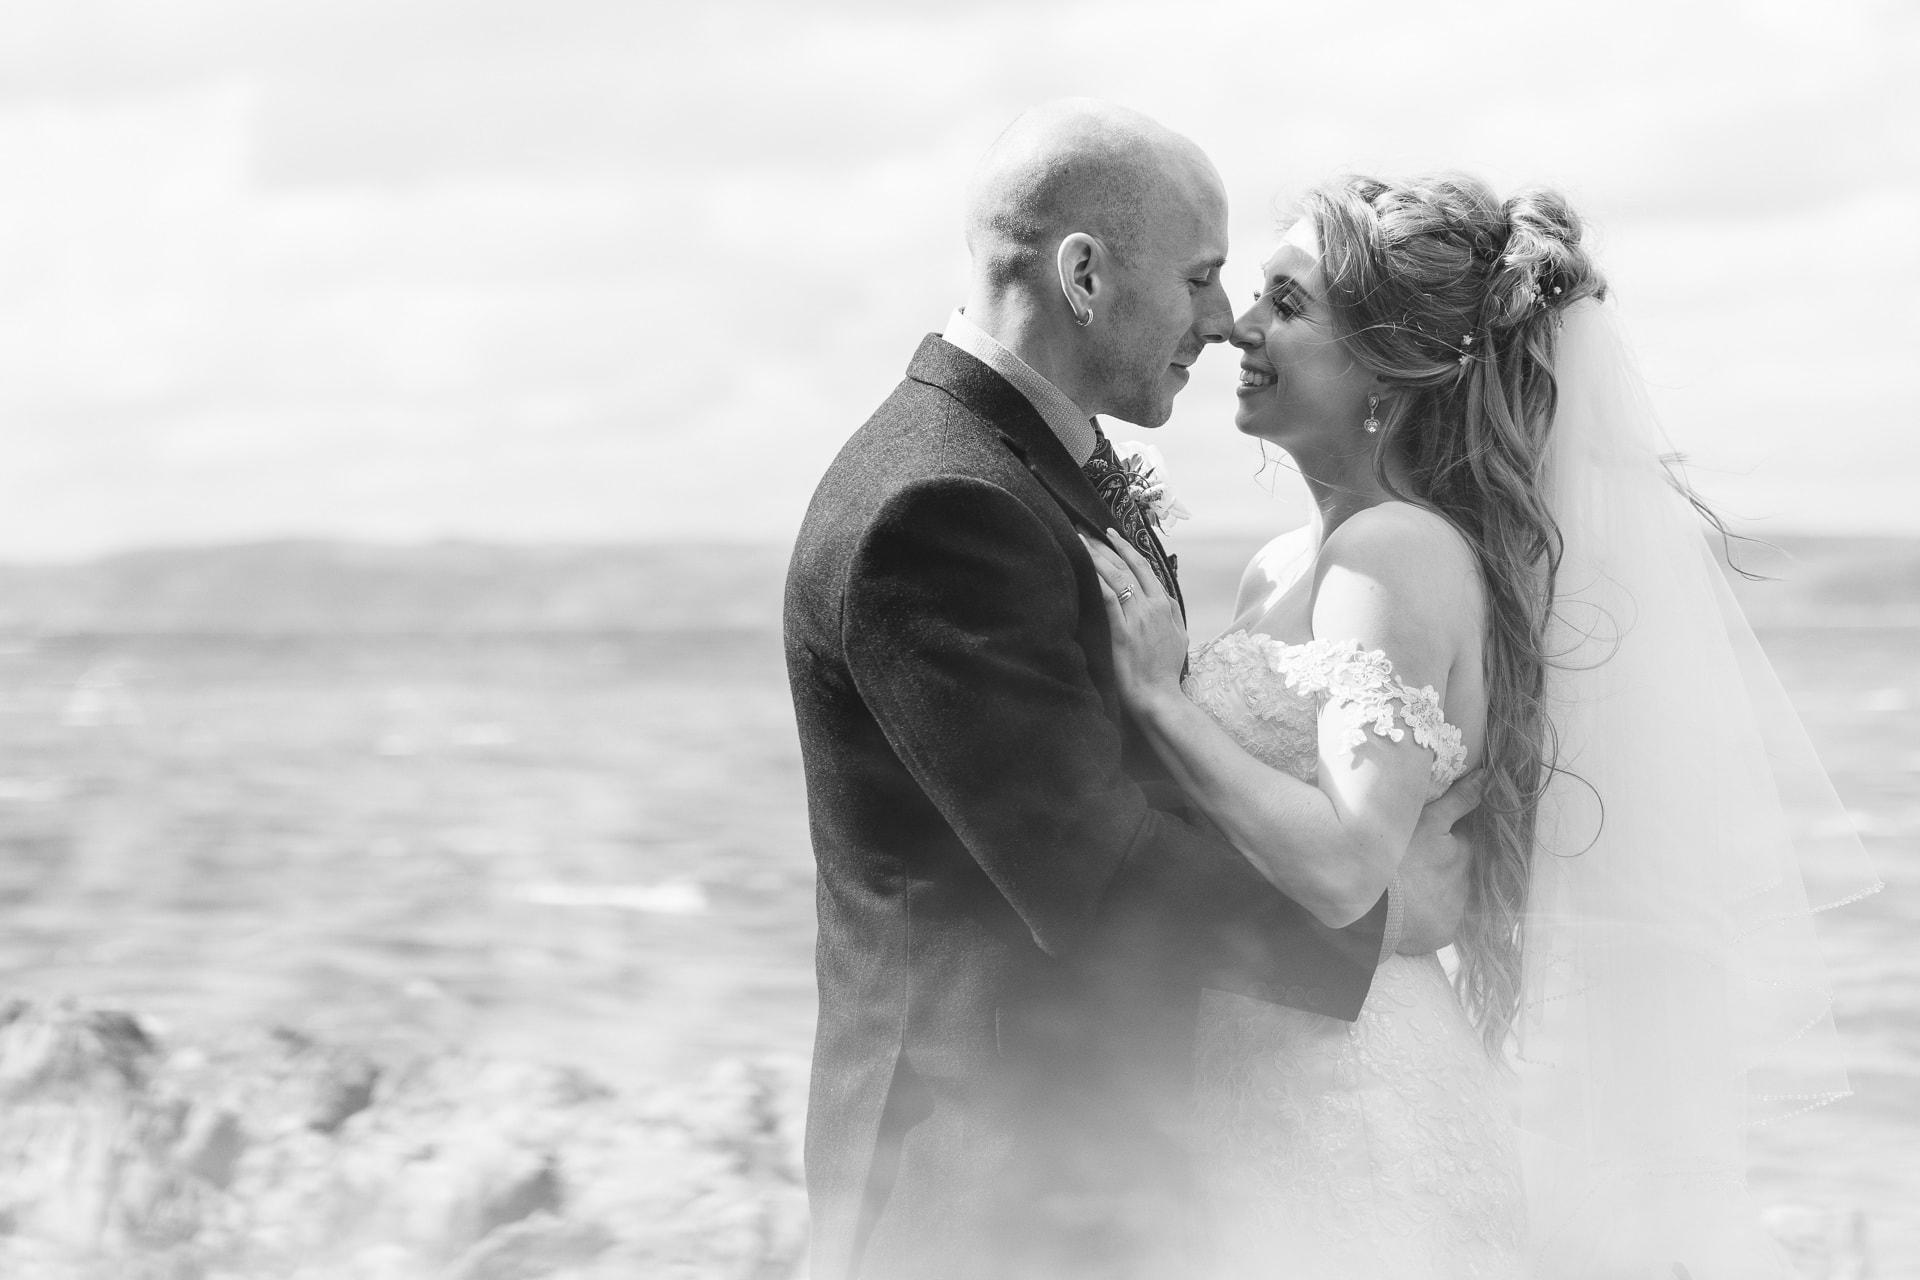 bridge and groom portrait on beach